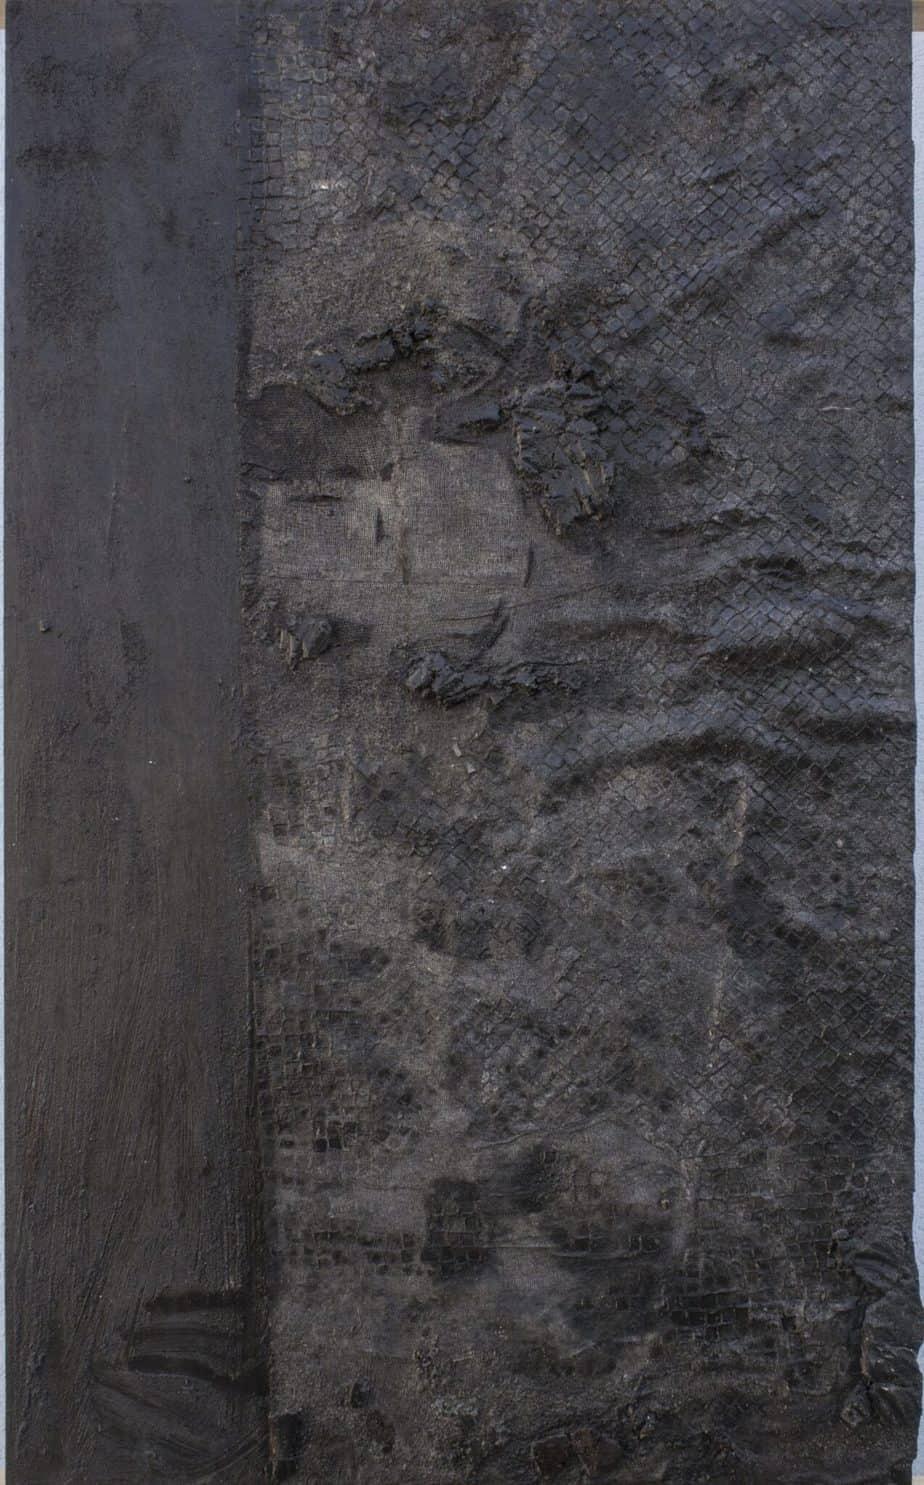 VESTIGIA - Felice Nittolo, Tecnica mista, 2008-2